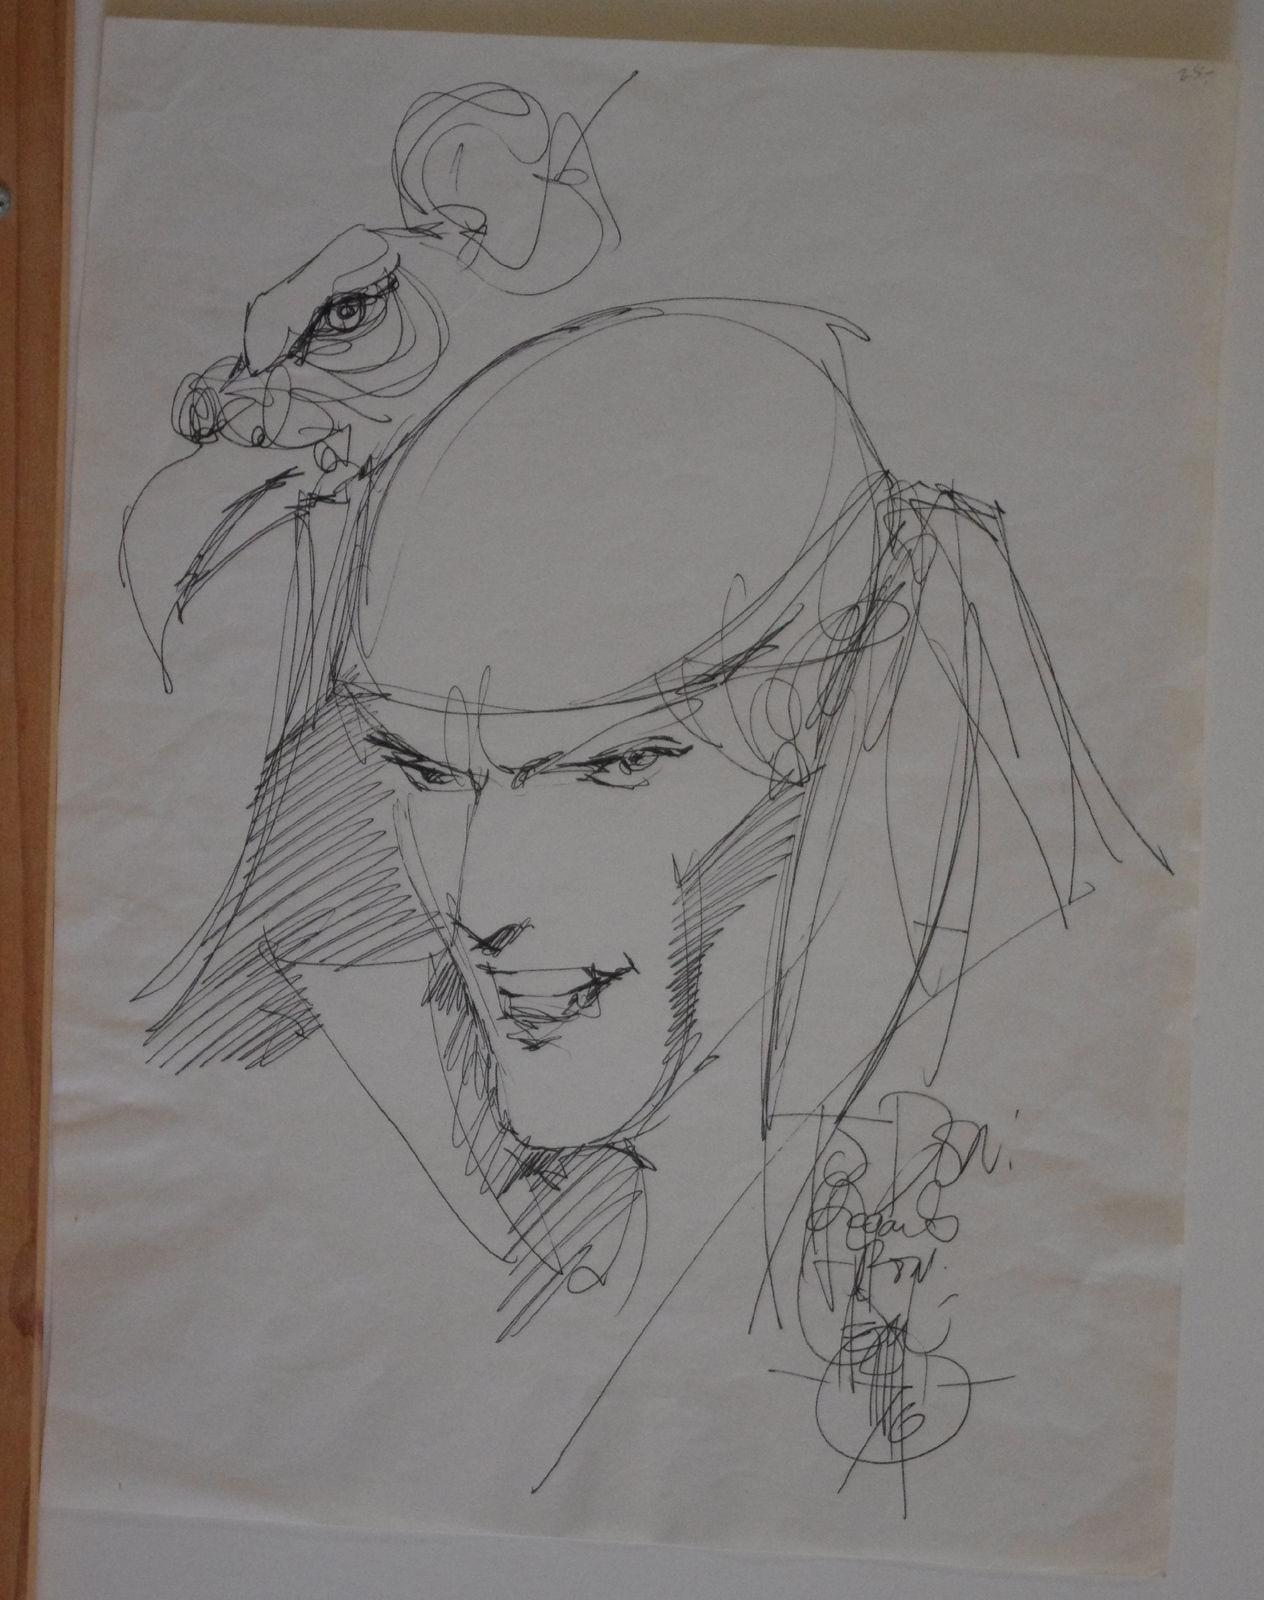 ALEX NINO Original art, Signed, GYPSY, Elektra like, 12x16, Sketch, 1976, lots more art in store